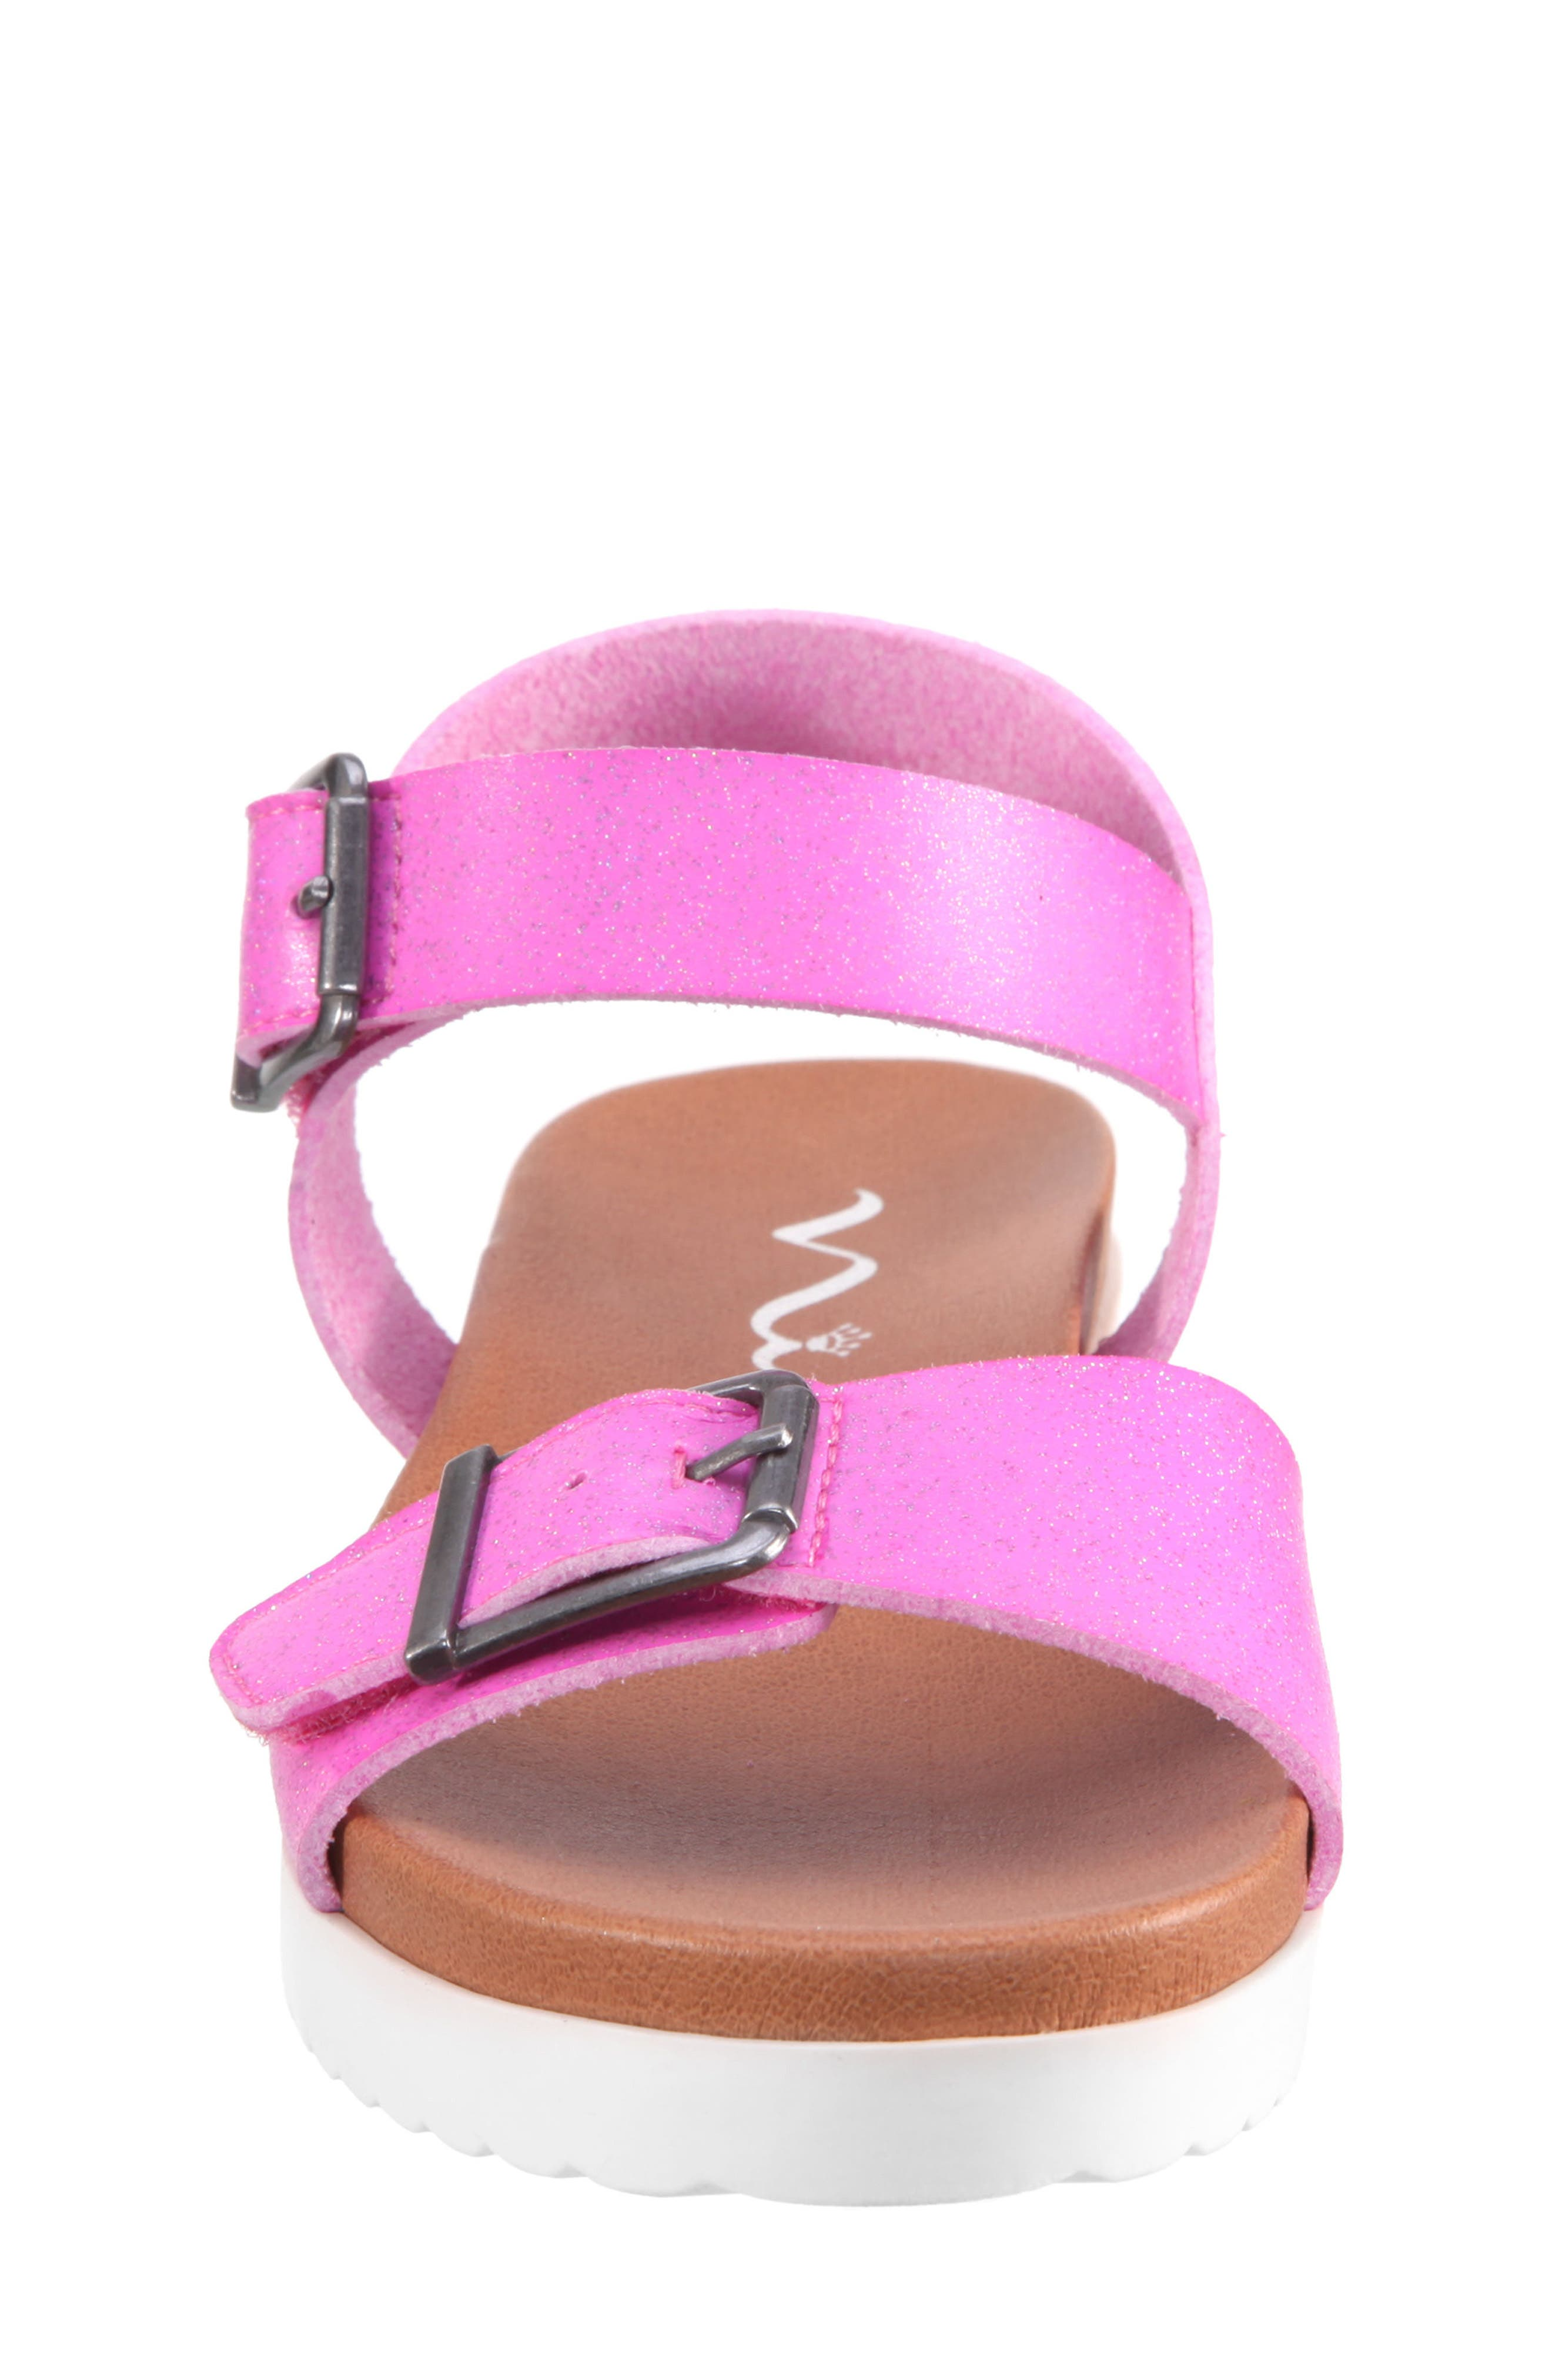 Jacklin3 Quarter Strap Sandal,                             Alternate thumbnail 4, color,                             Pink Dip Dye